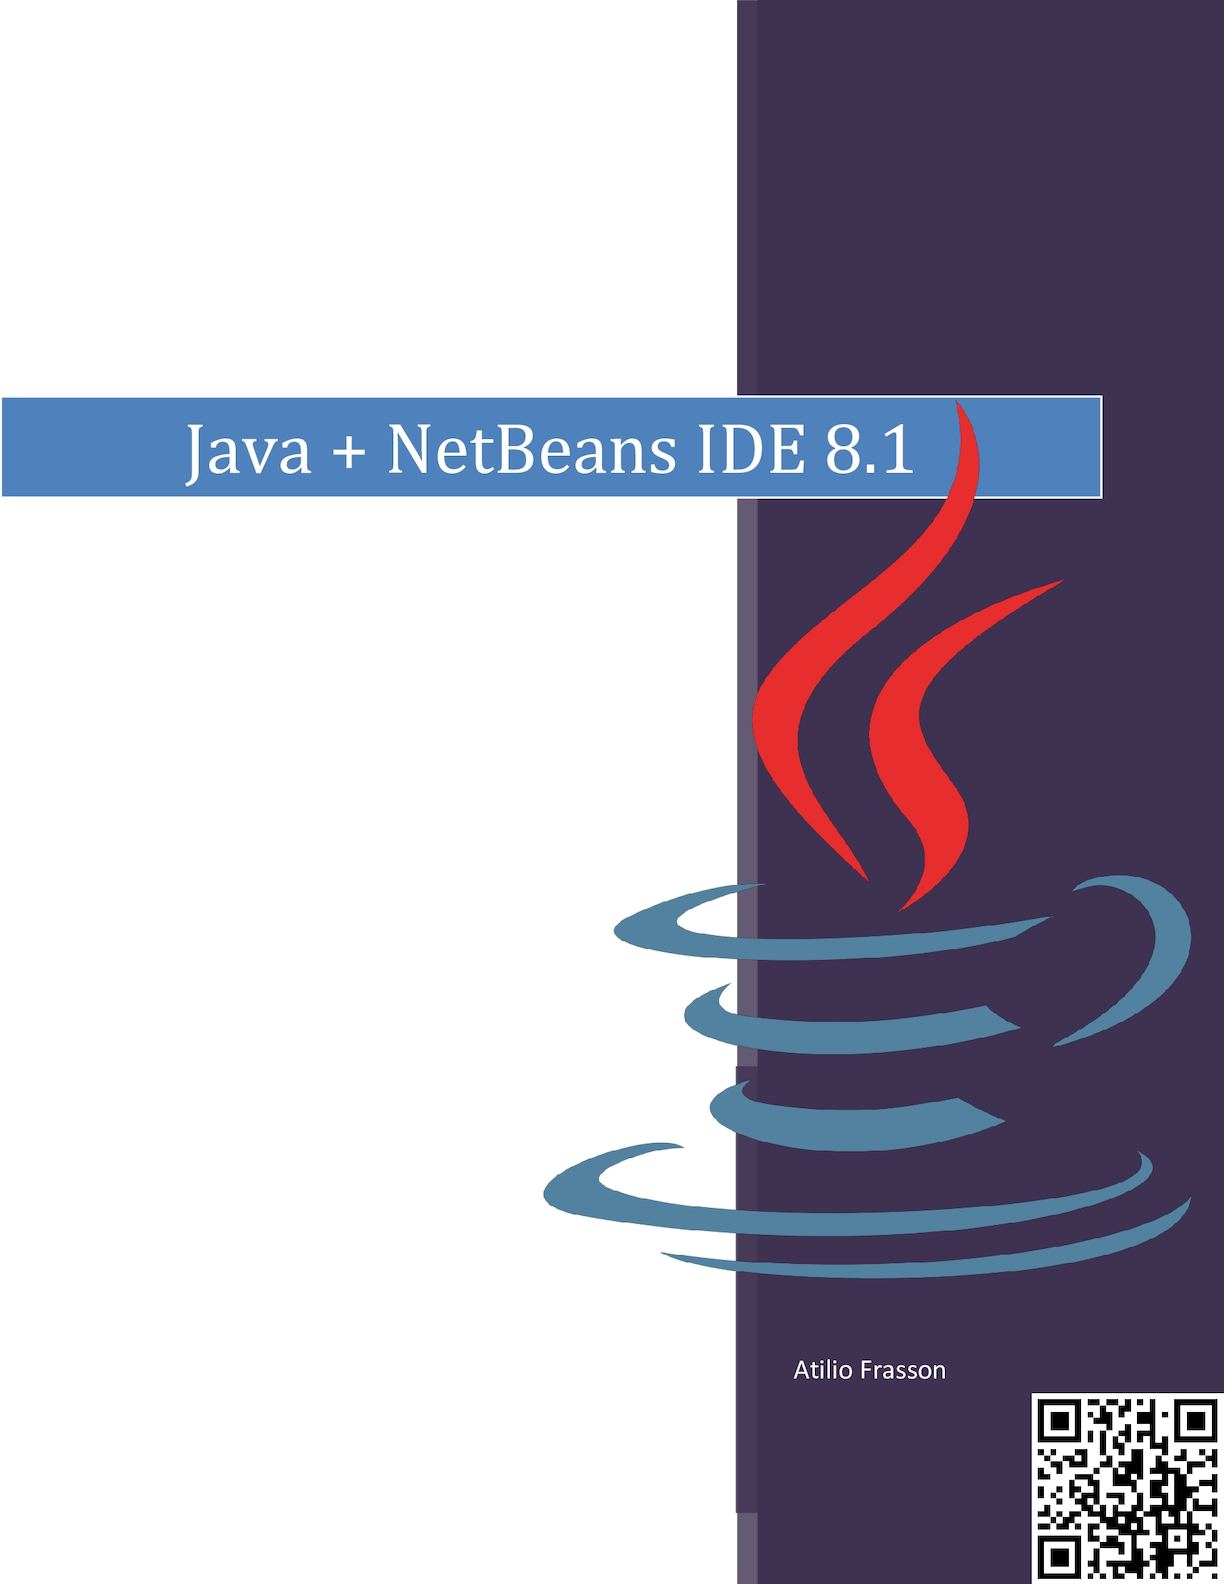 Calaméo - Java + NetBeans IDE 8.1